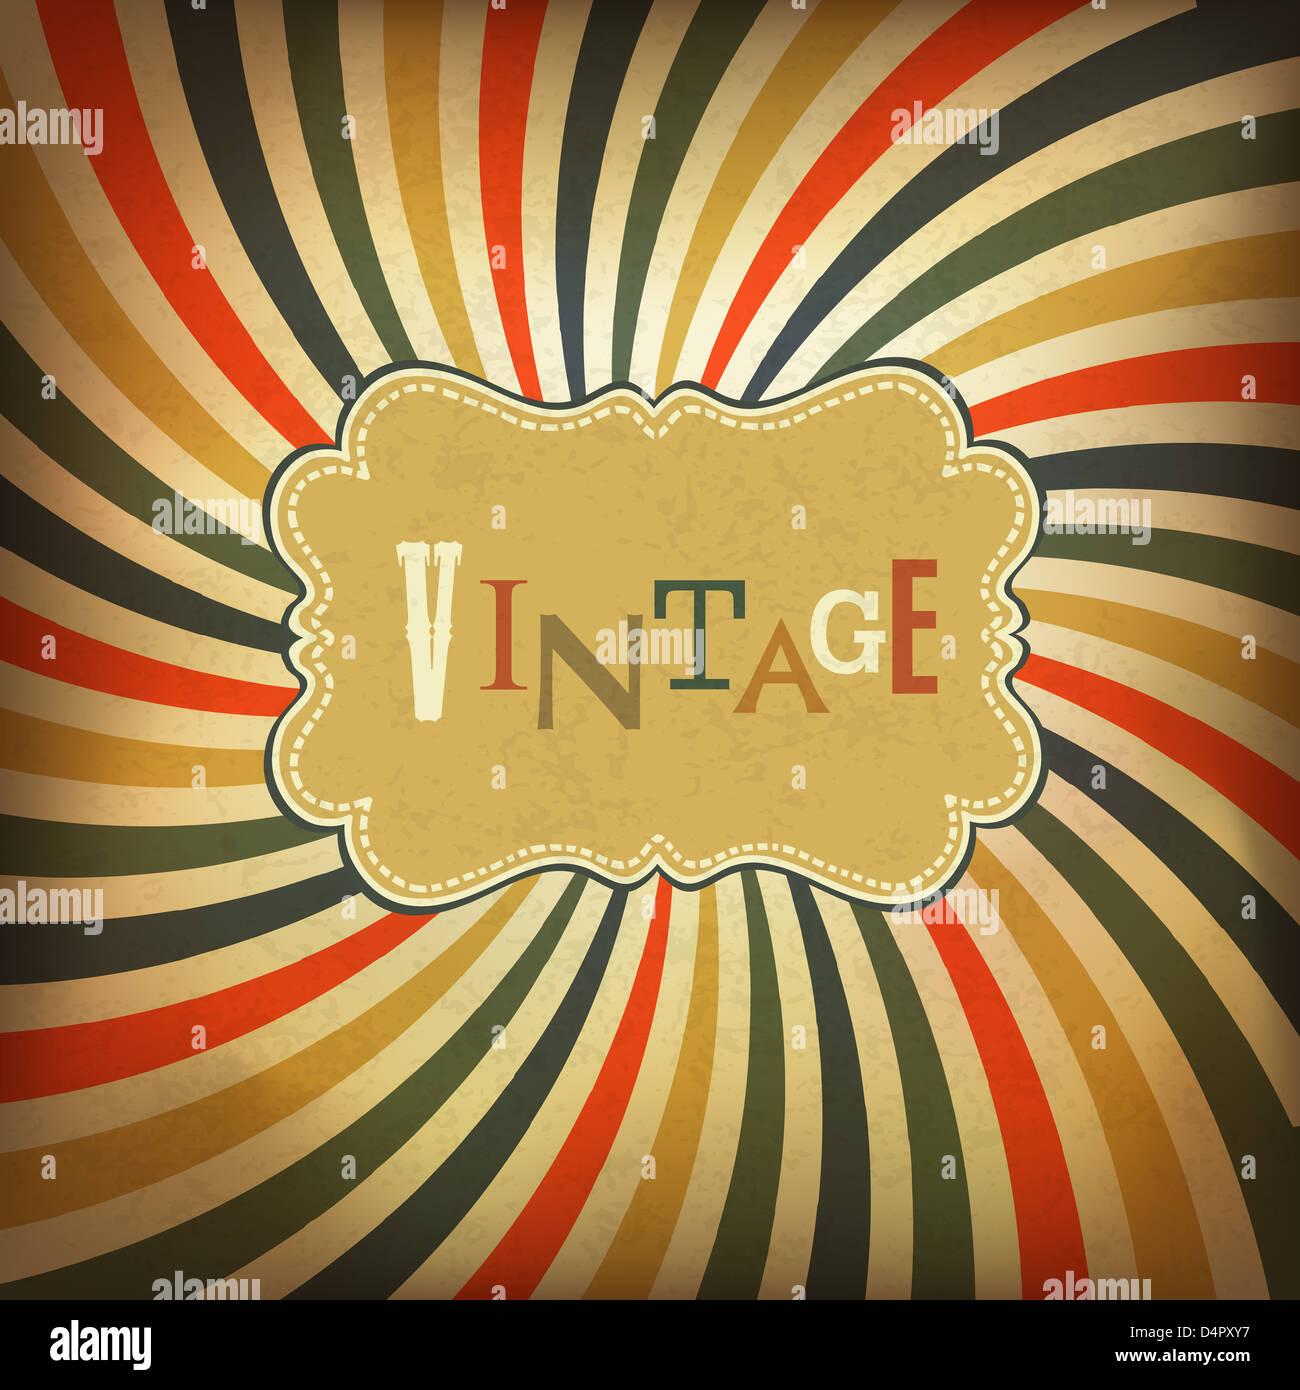 Grunge vintage background - Stock Image